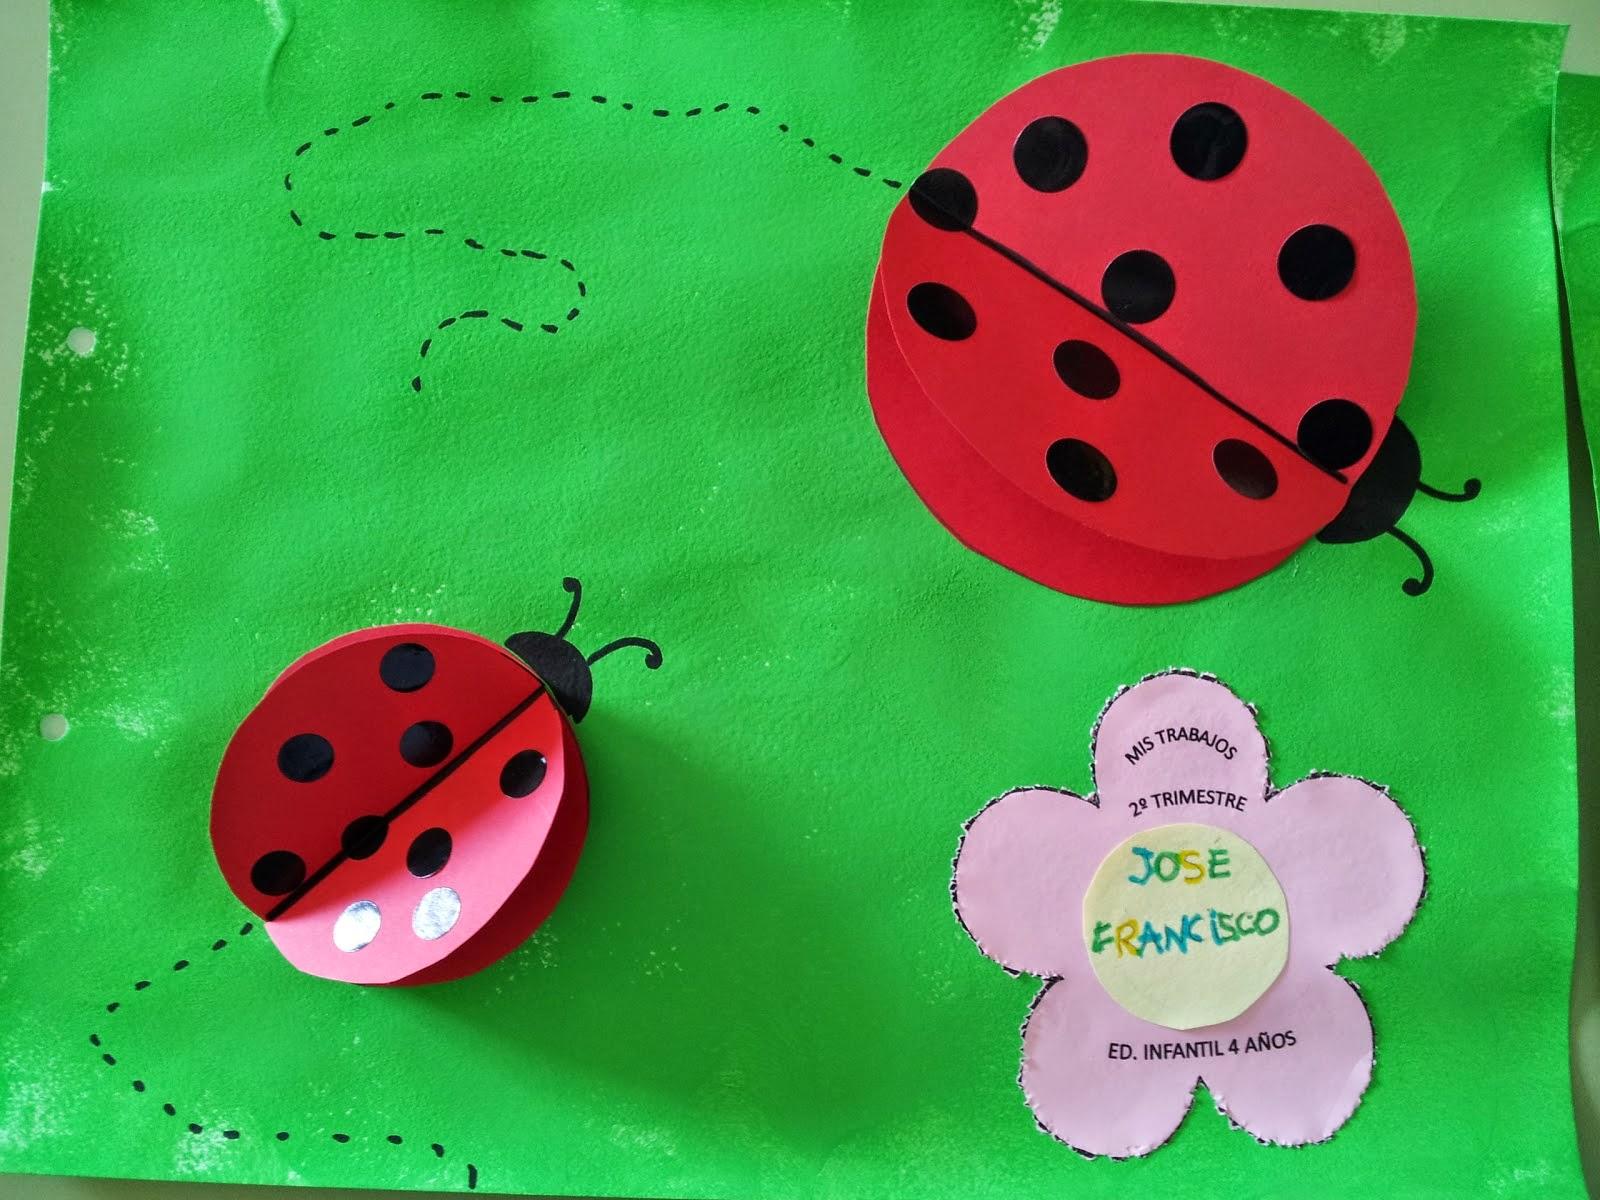 Caratulas Color Cuadernos Escolares Infantiles Dibujos Para 2: Okulöncesi Sanat Ve Fen Etkinlikleri: Okulöncesi Uğur